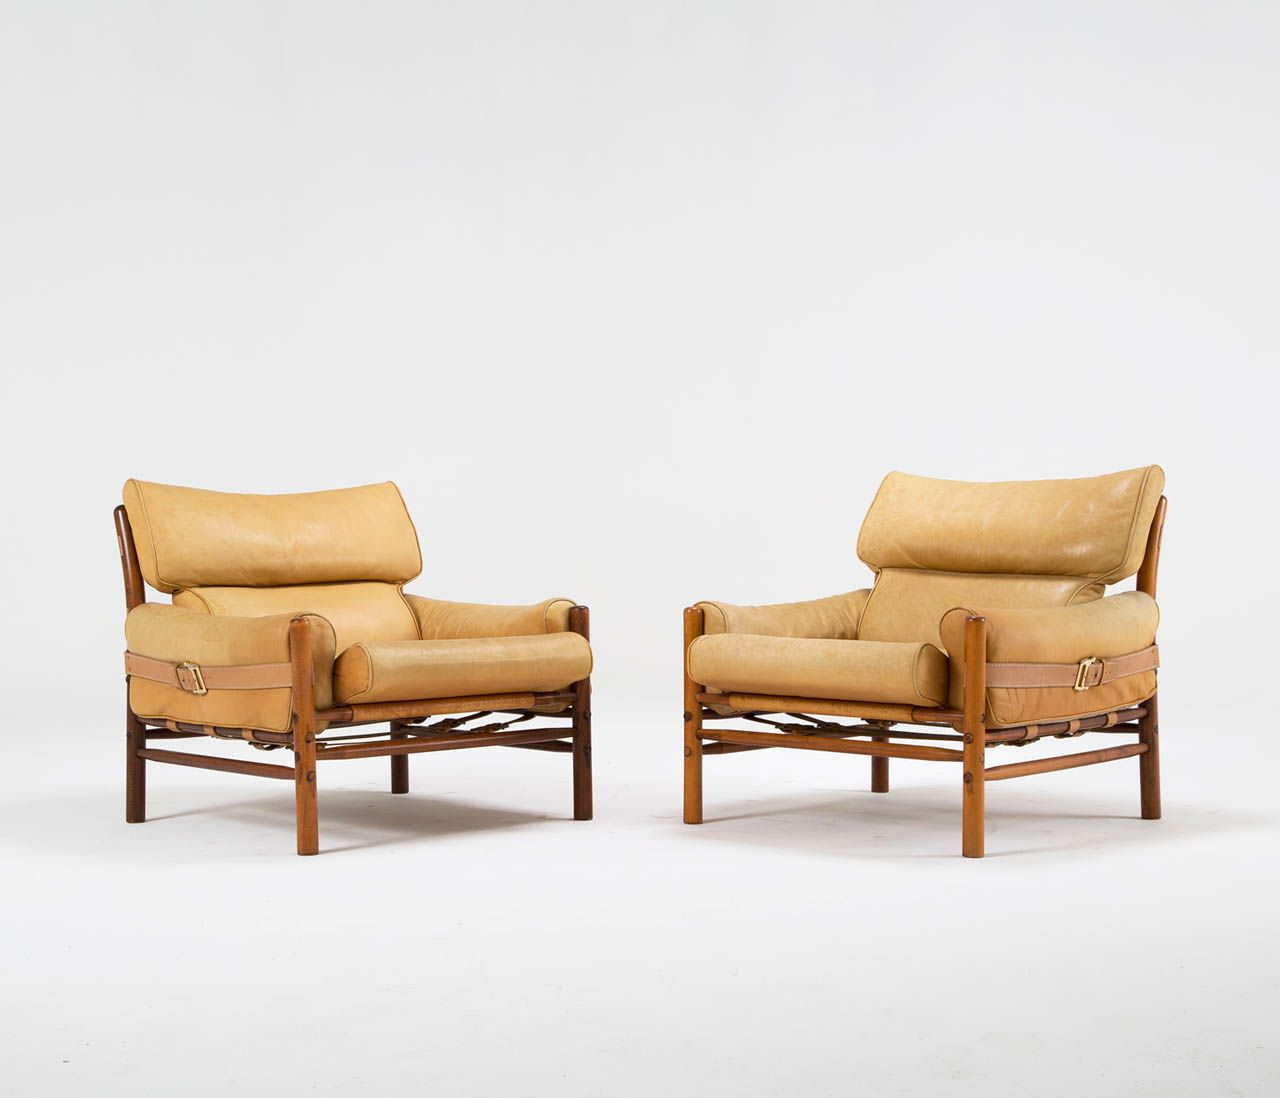 Rare Set Of 2 Arne Norell U0027Kontikiu0027 Easy Chairs In Teak